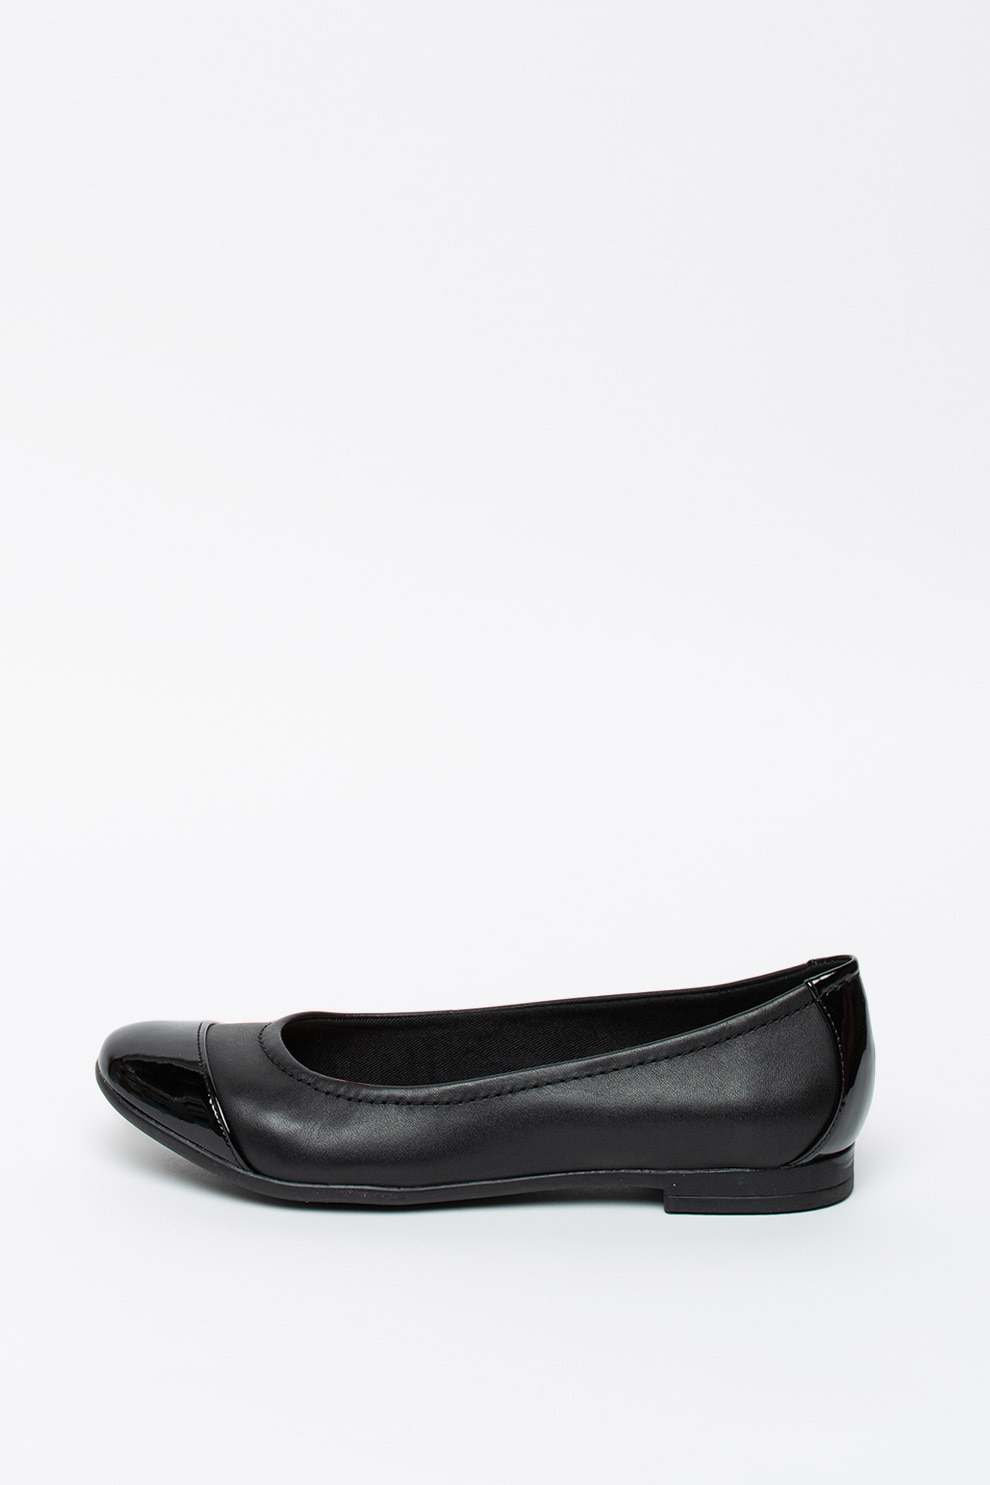 Clarks, Anatomic Haze bőr és műbőr lapos talpú cipő